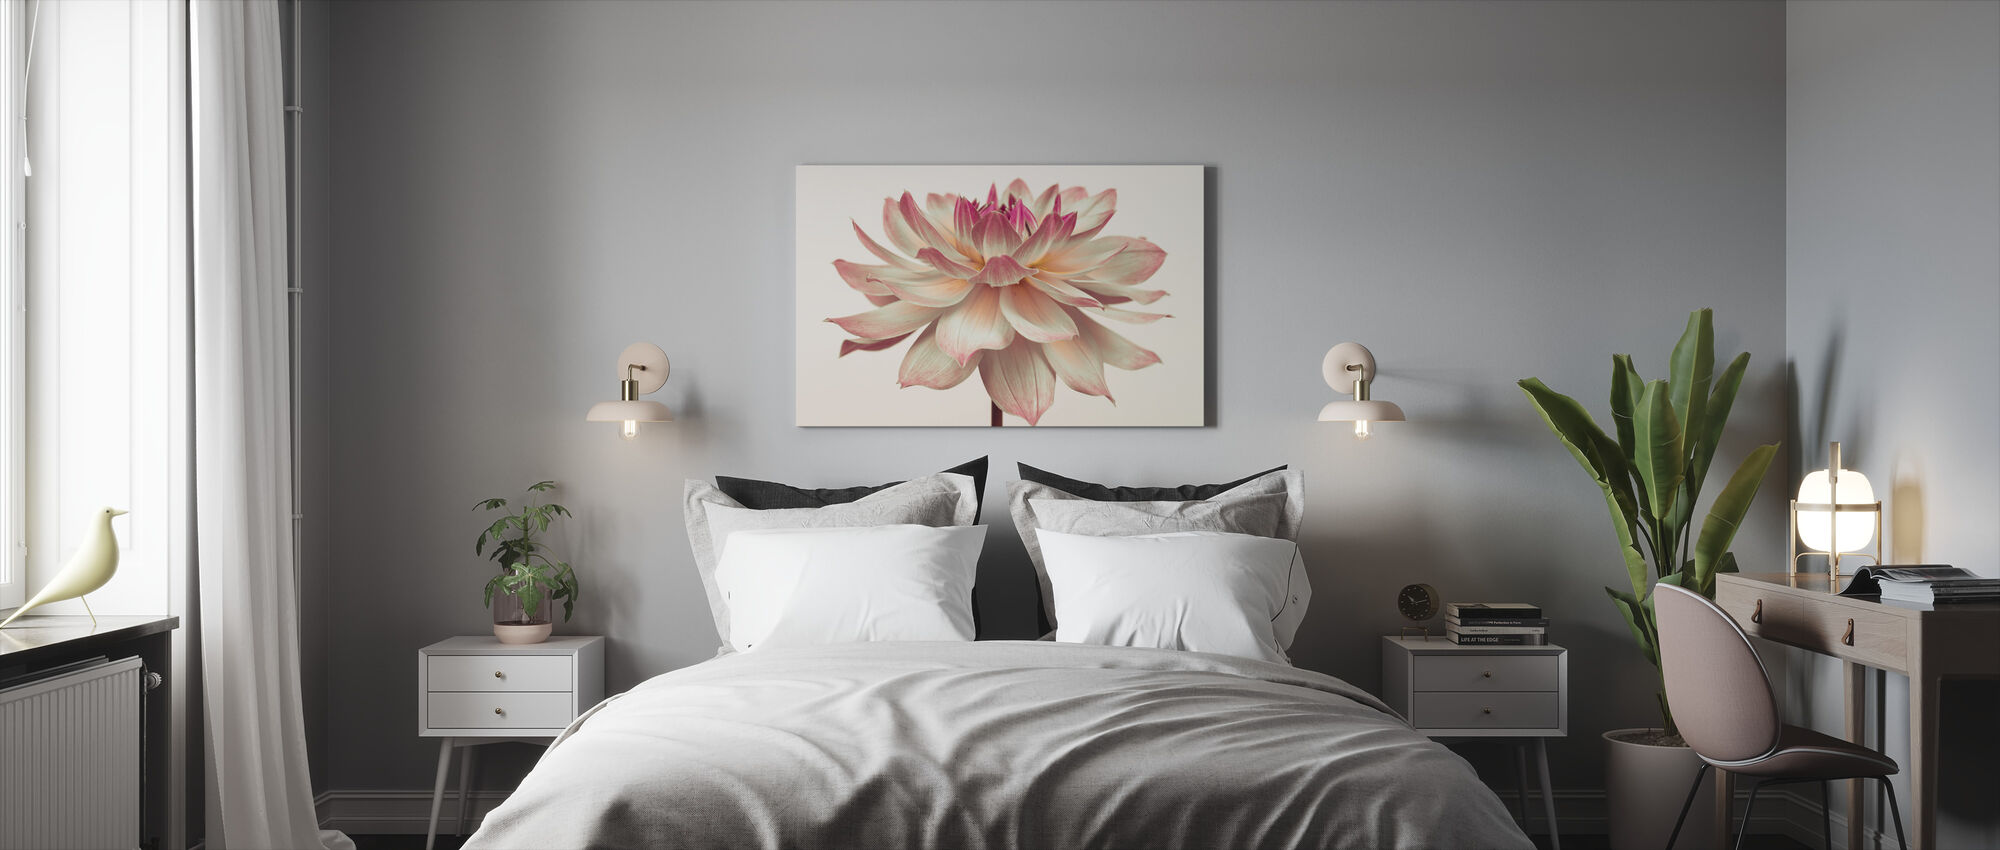 Dahlia Flower - Canvas print - Bedroom